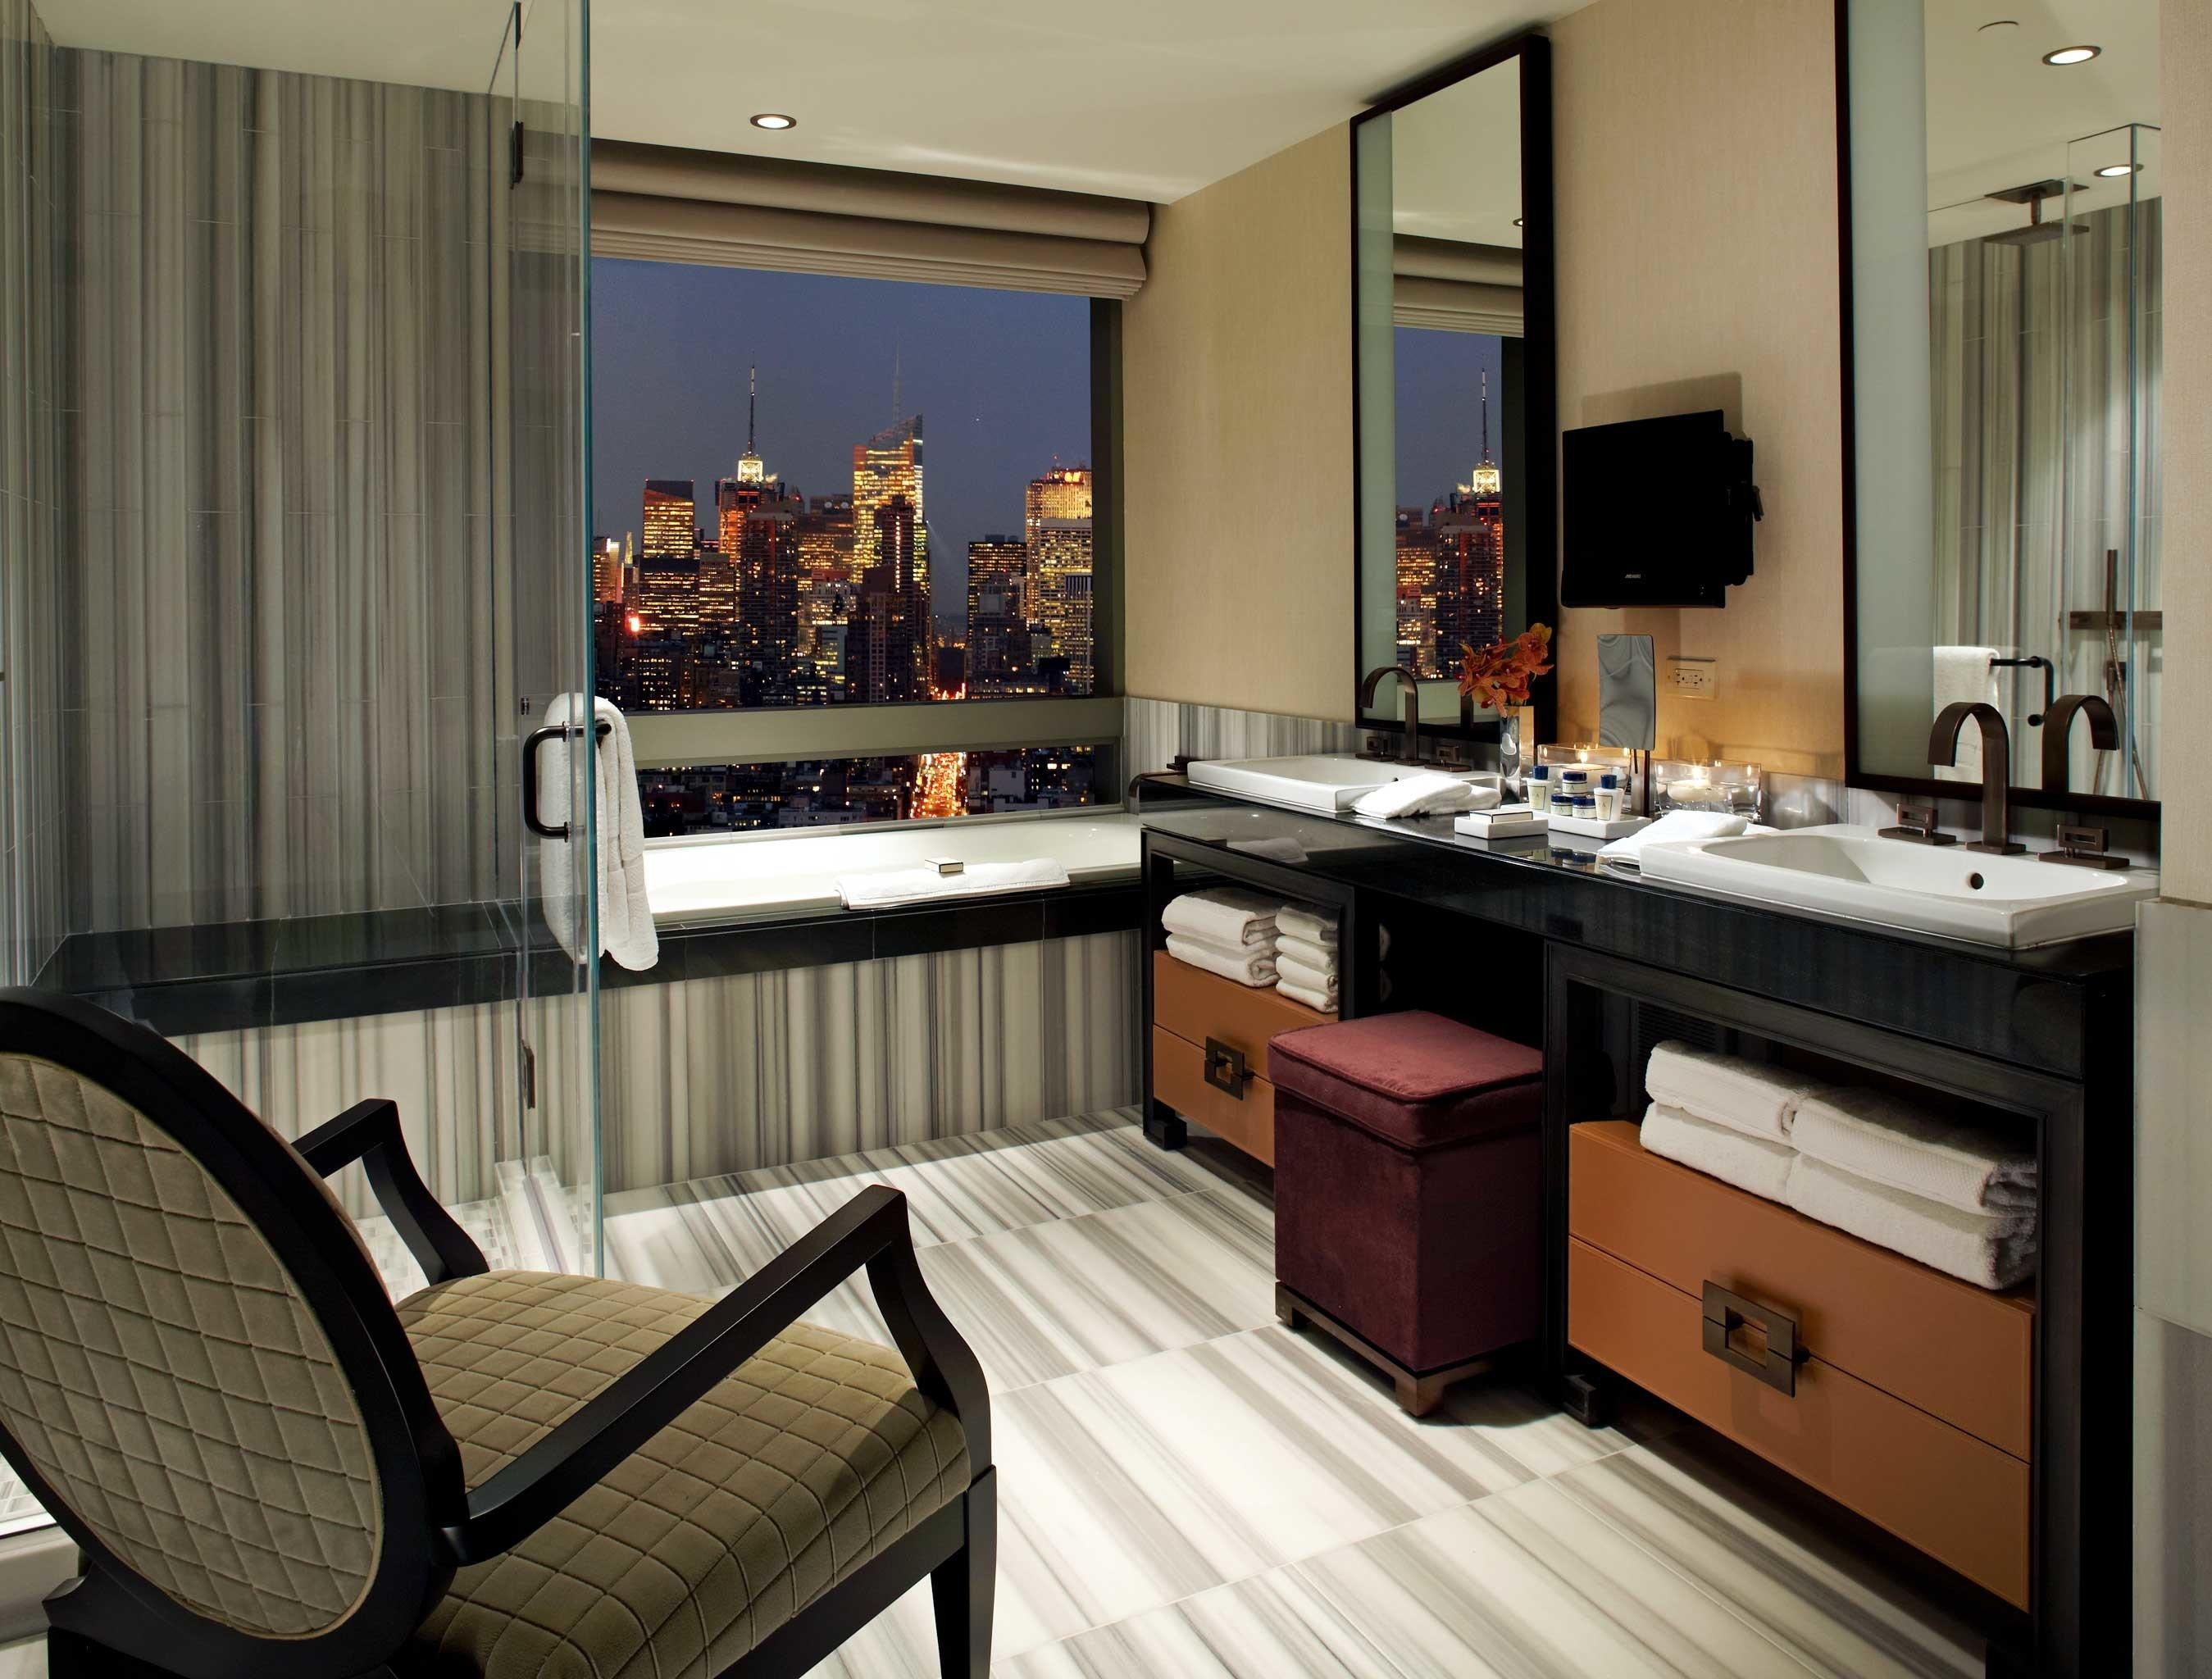 Bath Bedroom City Elegant Luxury Spa Wellness property home Kitchen cabinetry living room Suite cottage condominium